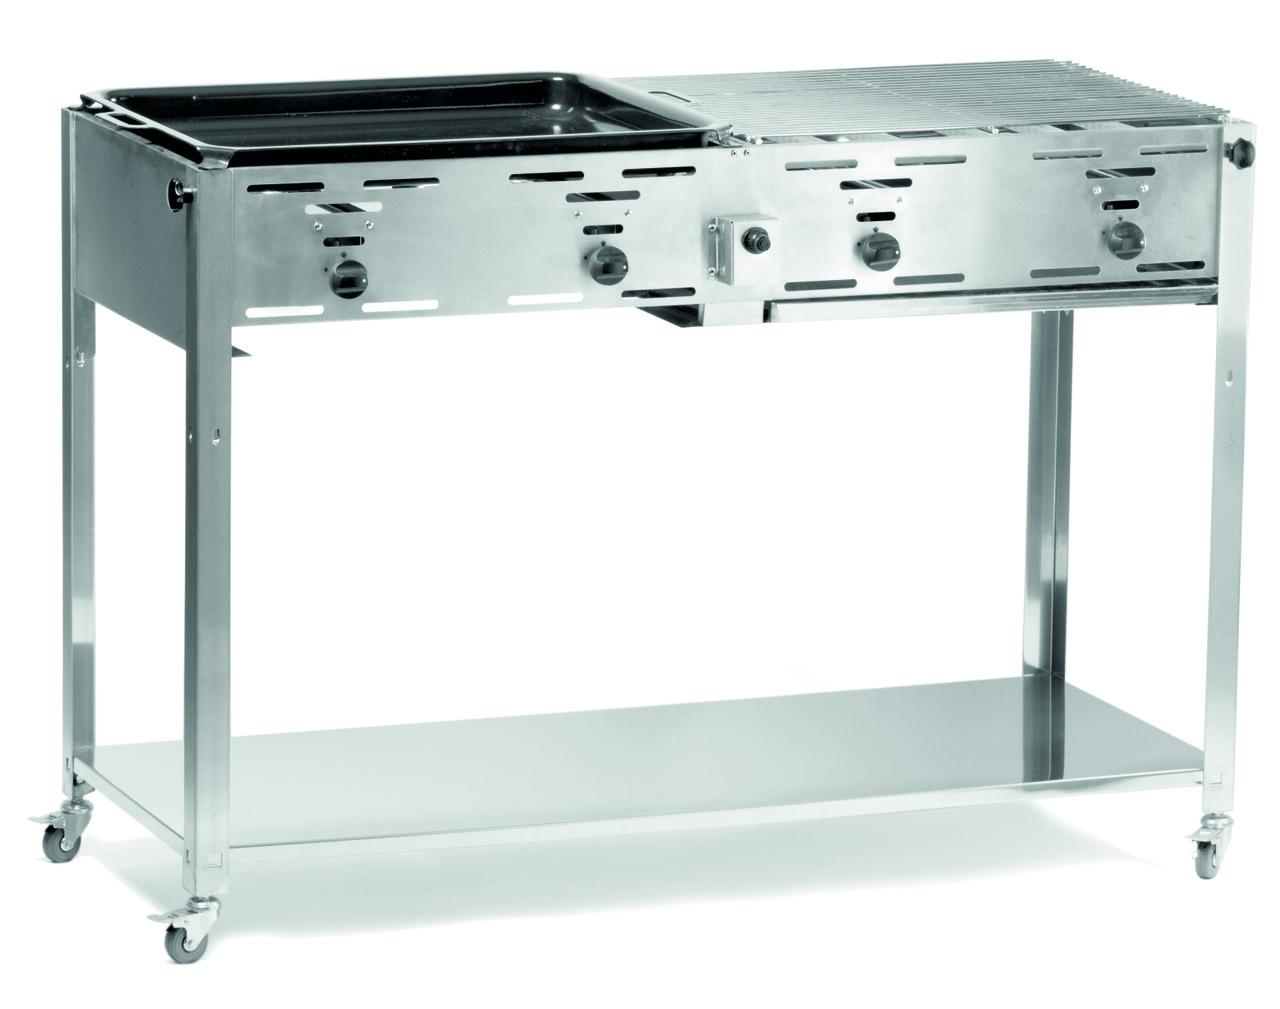 Гриль для барбекю газовый Grill-Master Quattro 154908 Hendi (Нидерланды)